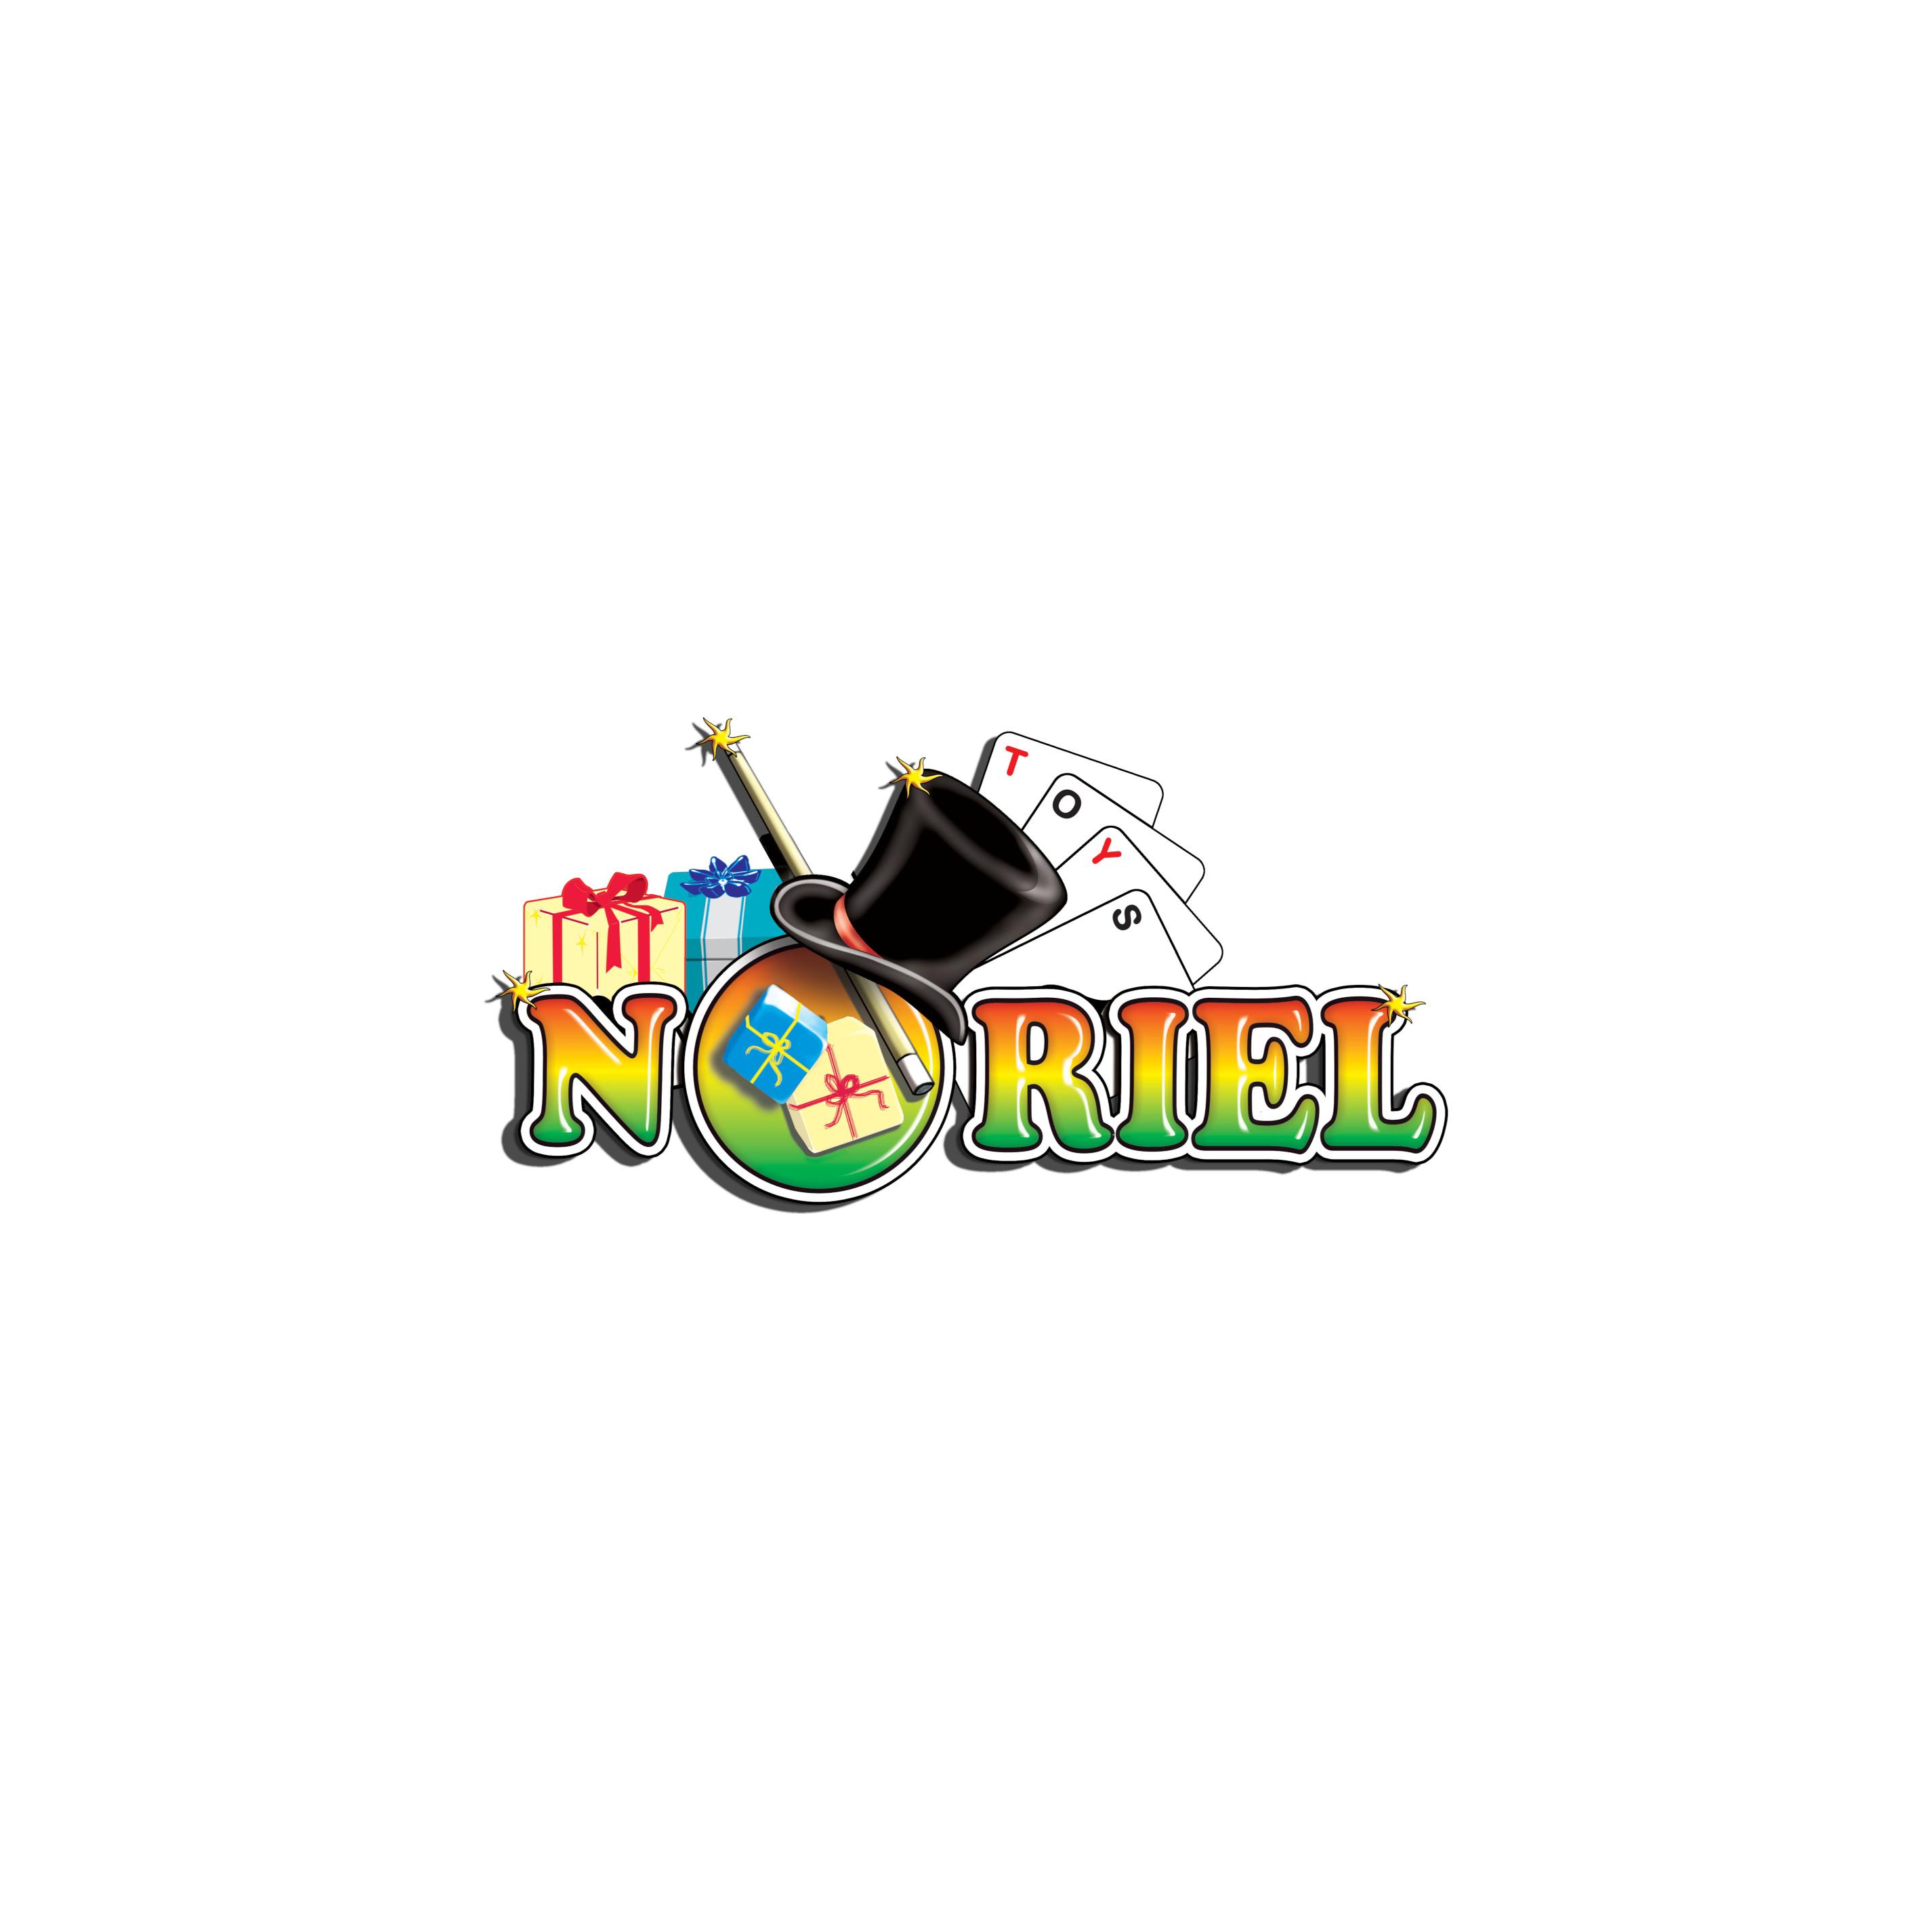 21572_2018_011w Masinuta Hot Wheels Monster Jam, Radical Rescue, FLW82